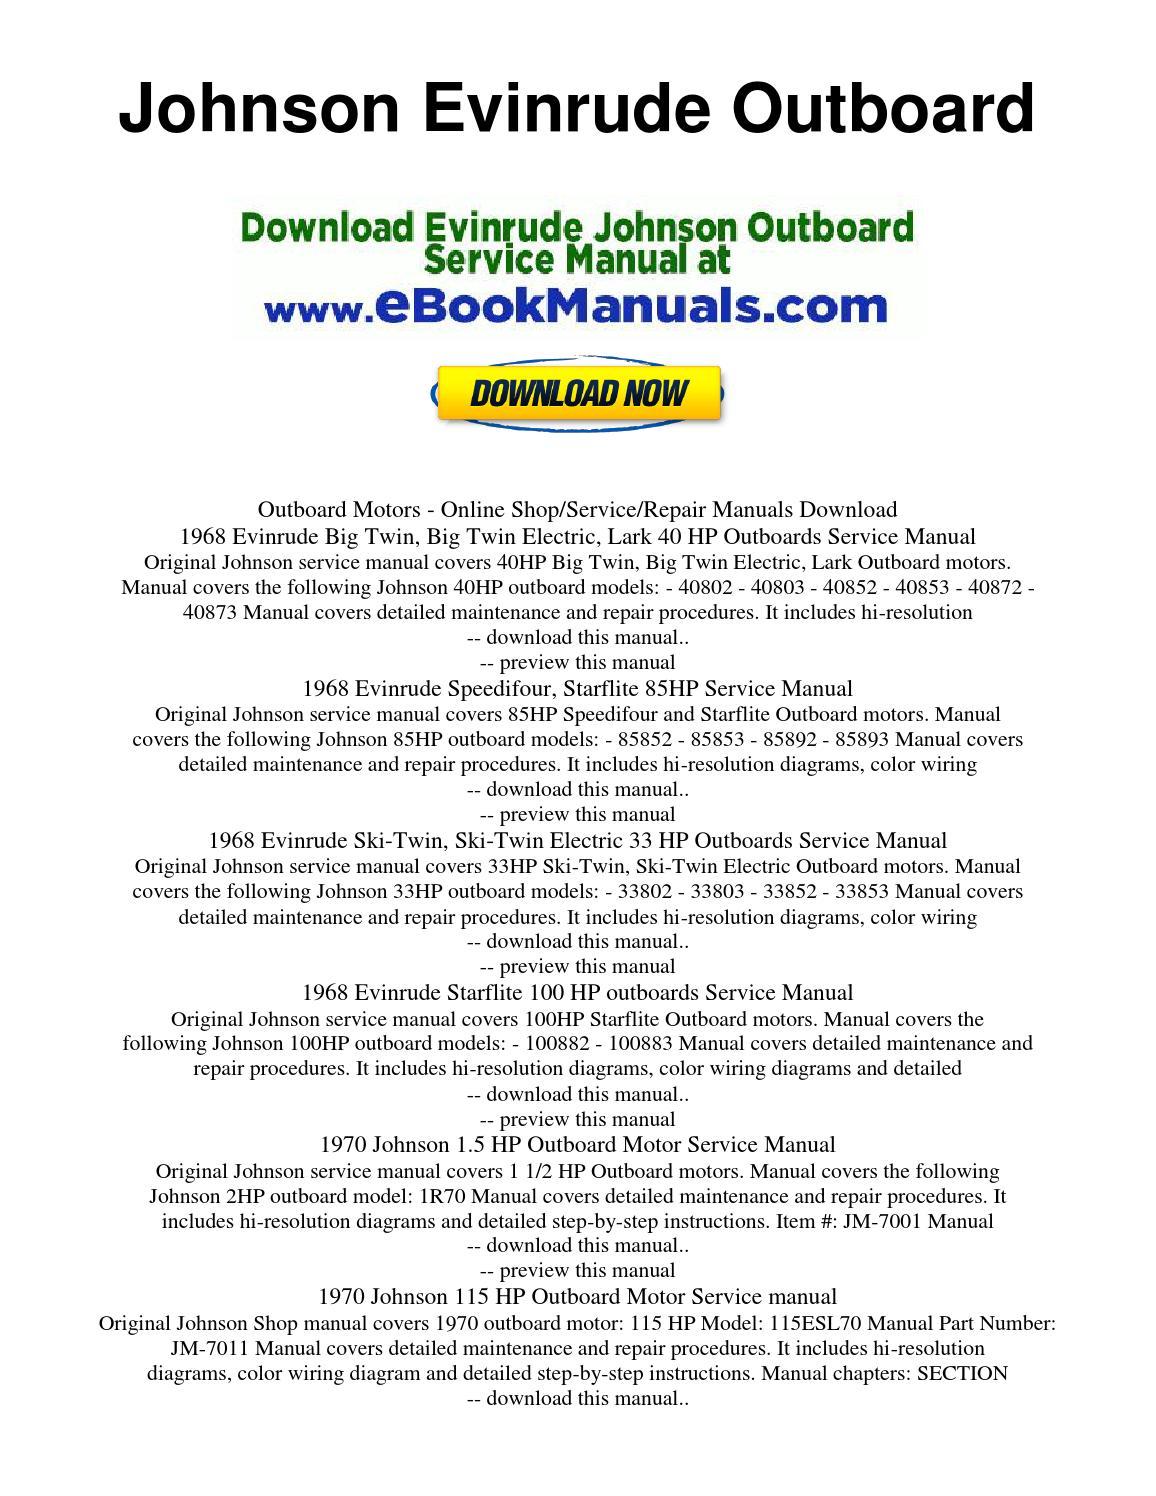 Johnson Evinrude Outboard By Jonhson Evinrude Manual Issuu